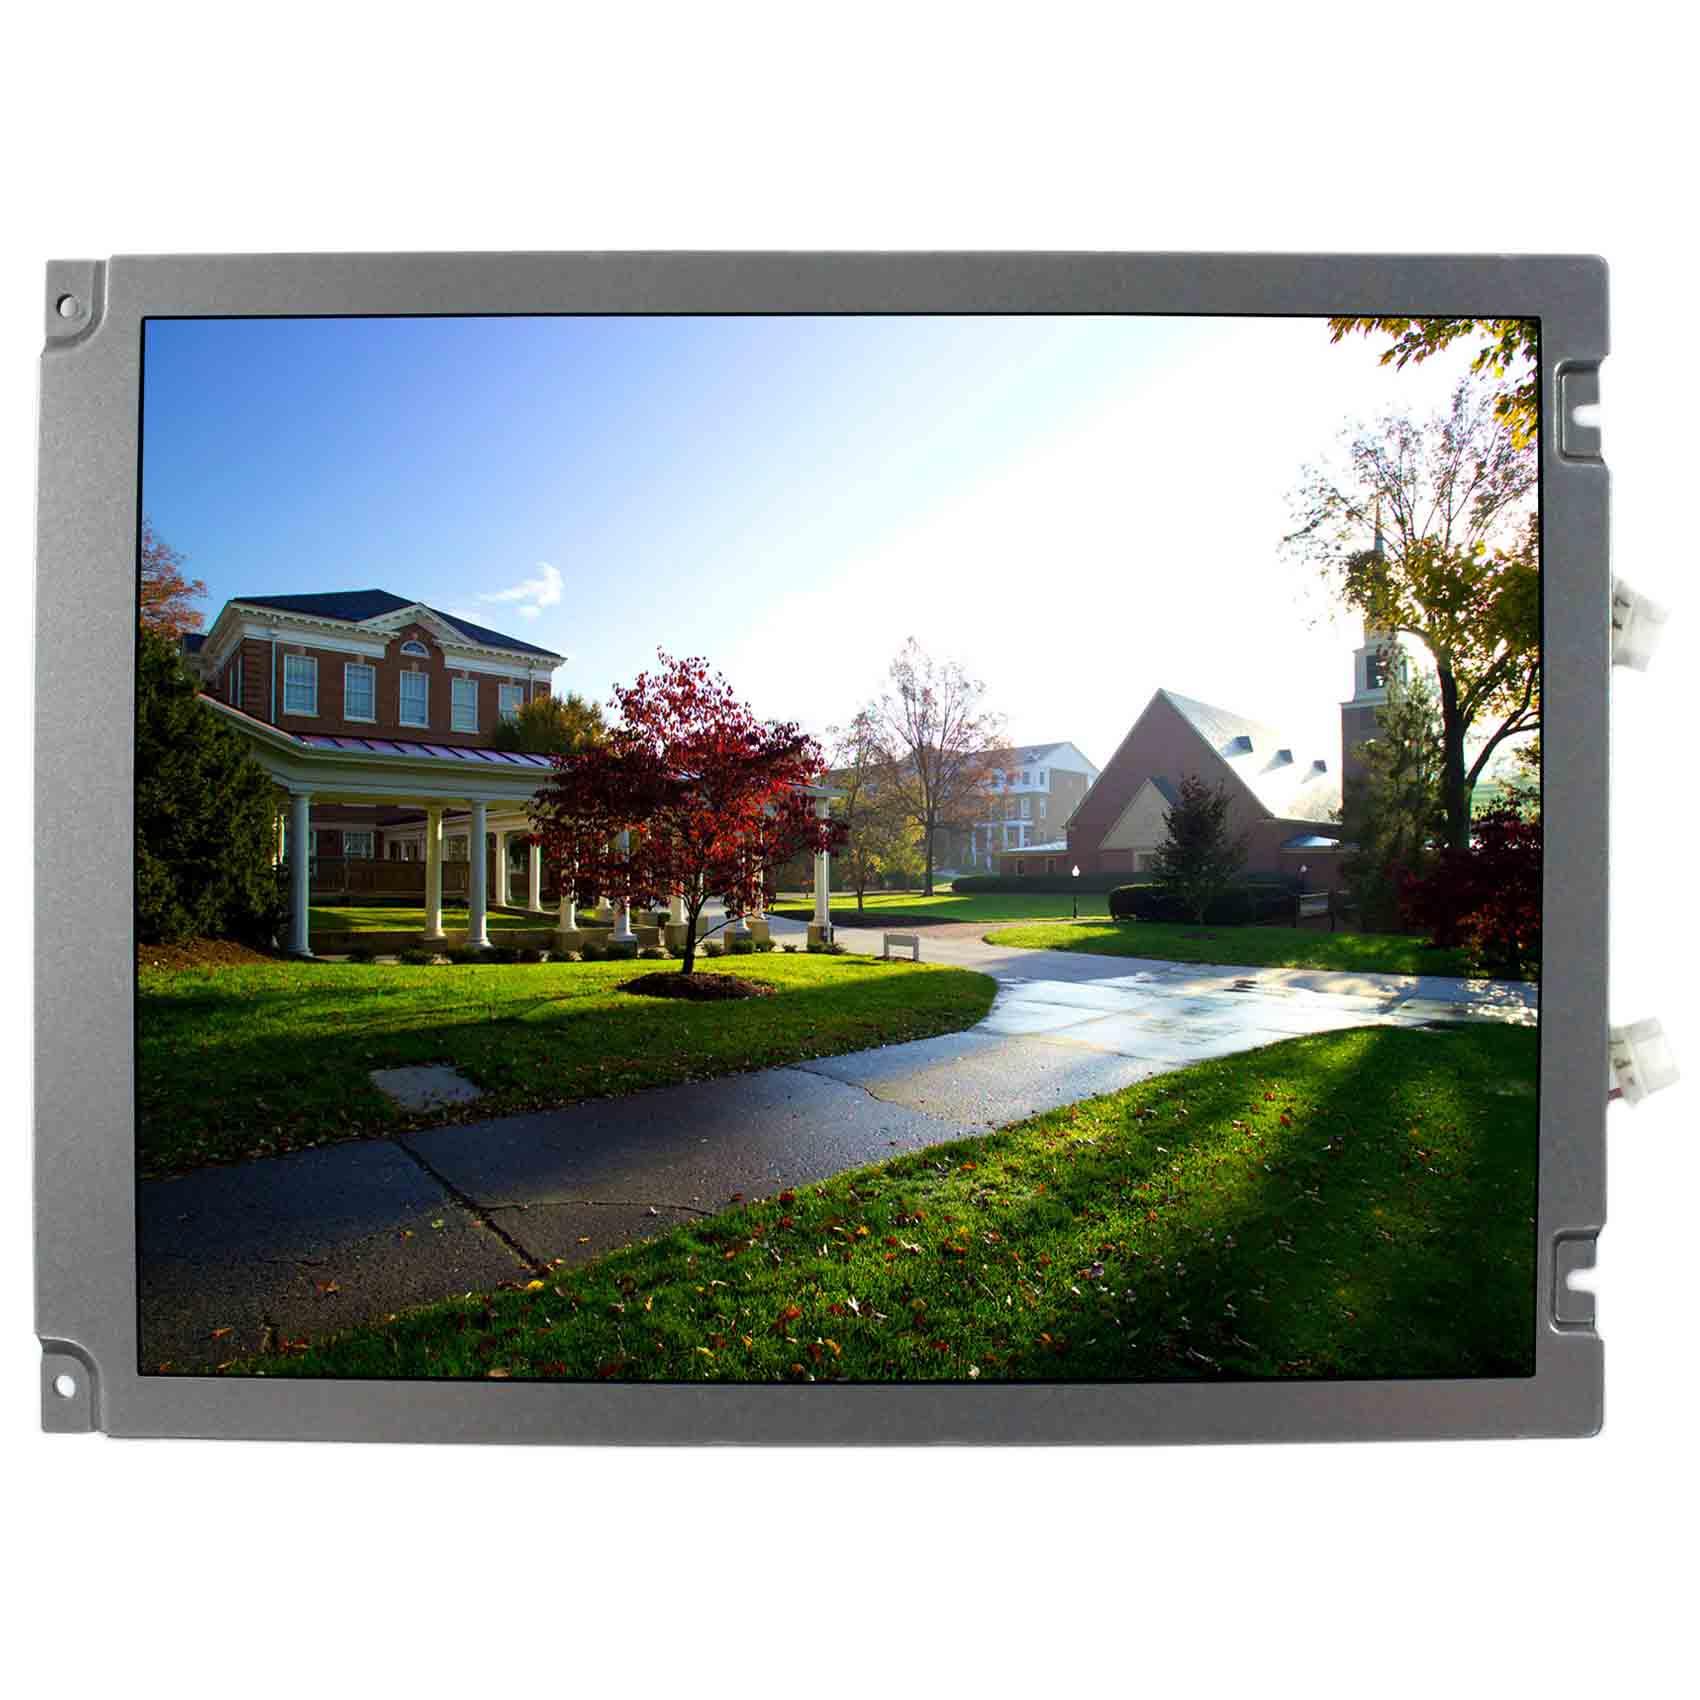 12.1  12.1inch 800X600 LCD Screen LQ121S1L7512.1  12.1inch 800X600 LCD Screen LQ121S1L75